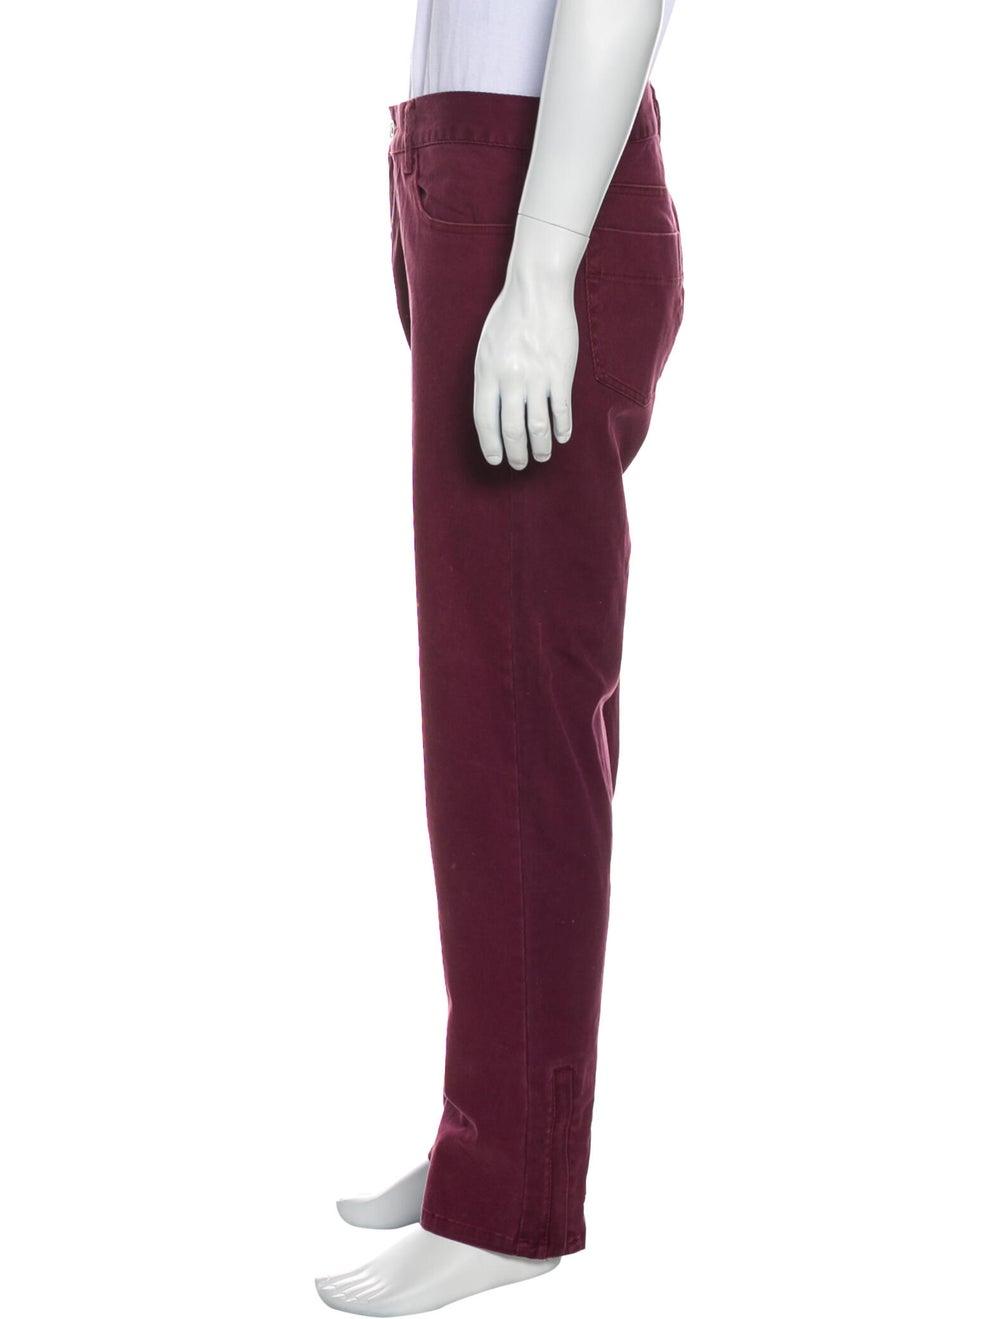 Gucci Corduroy Pants - image 2